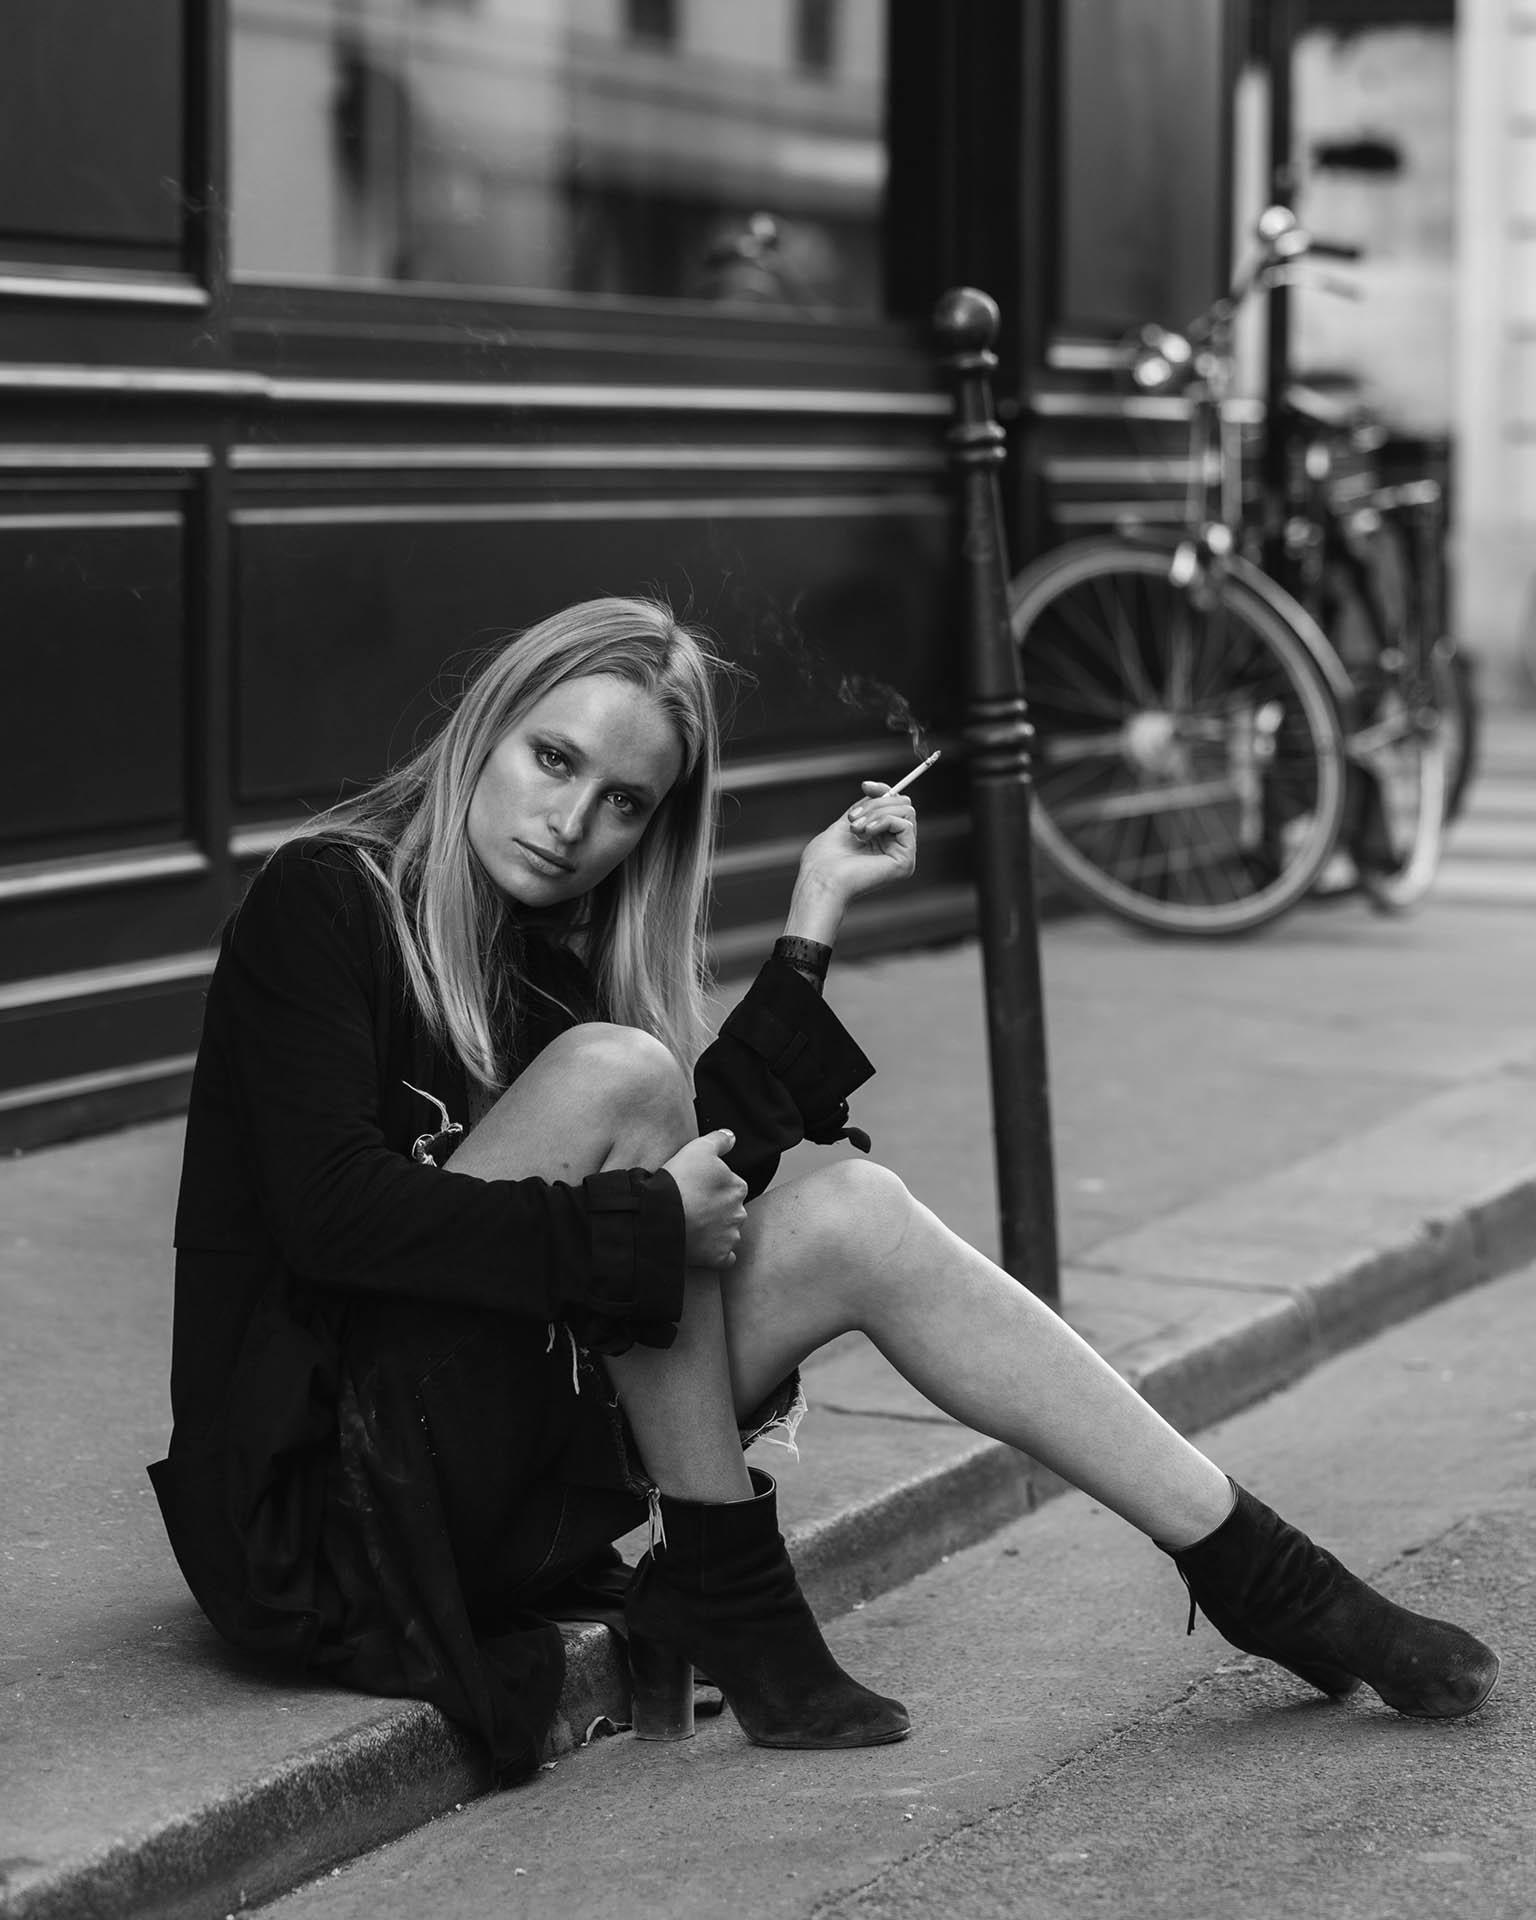 icemecri-Antoinette_Monier19